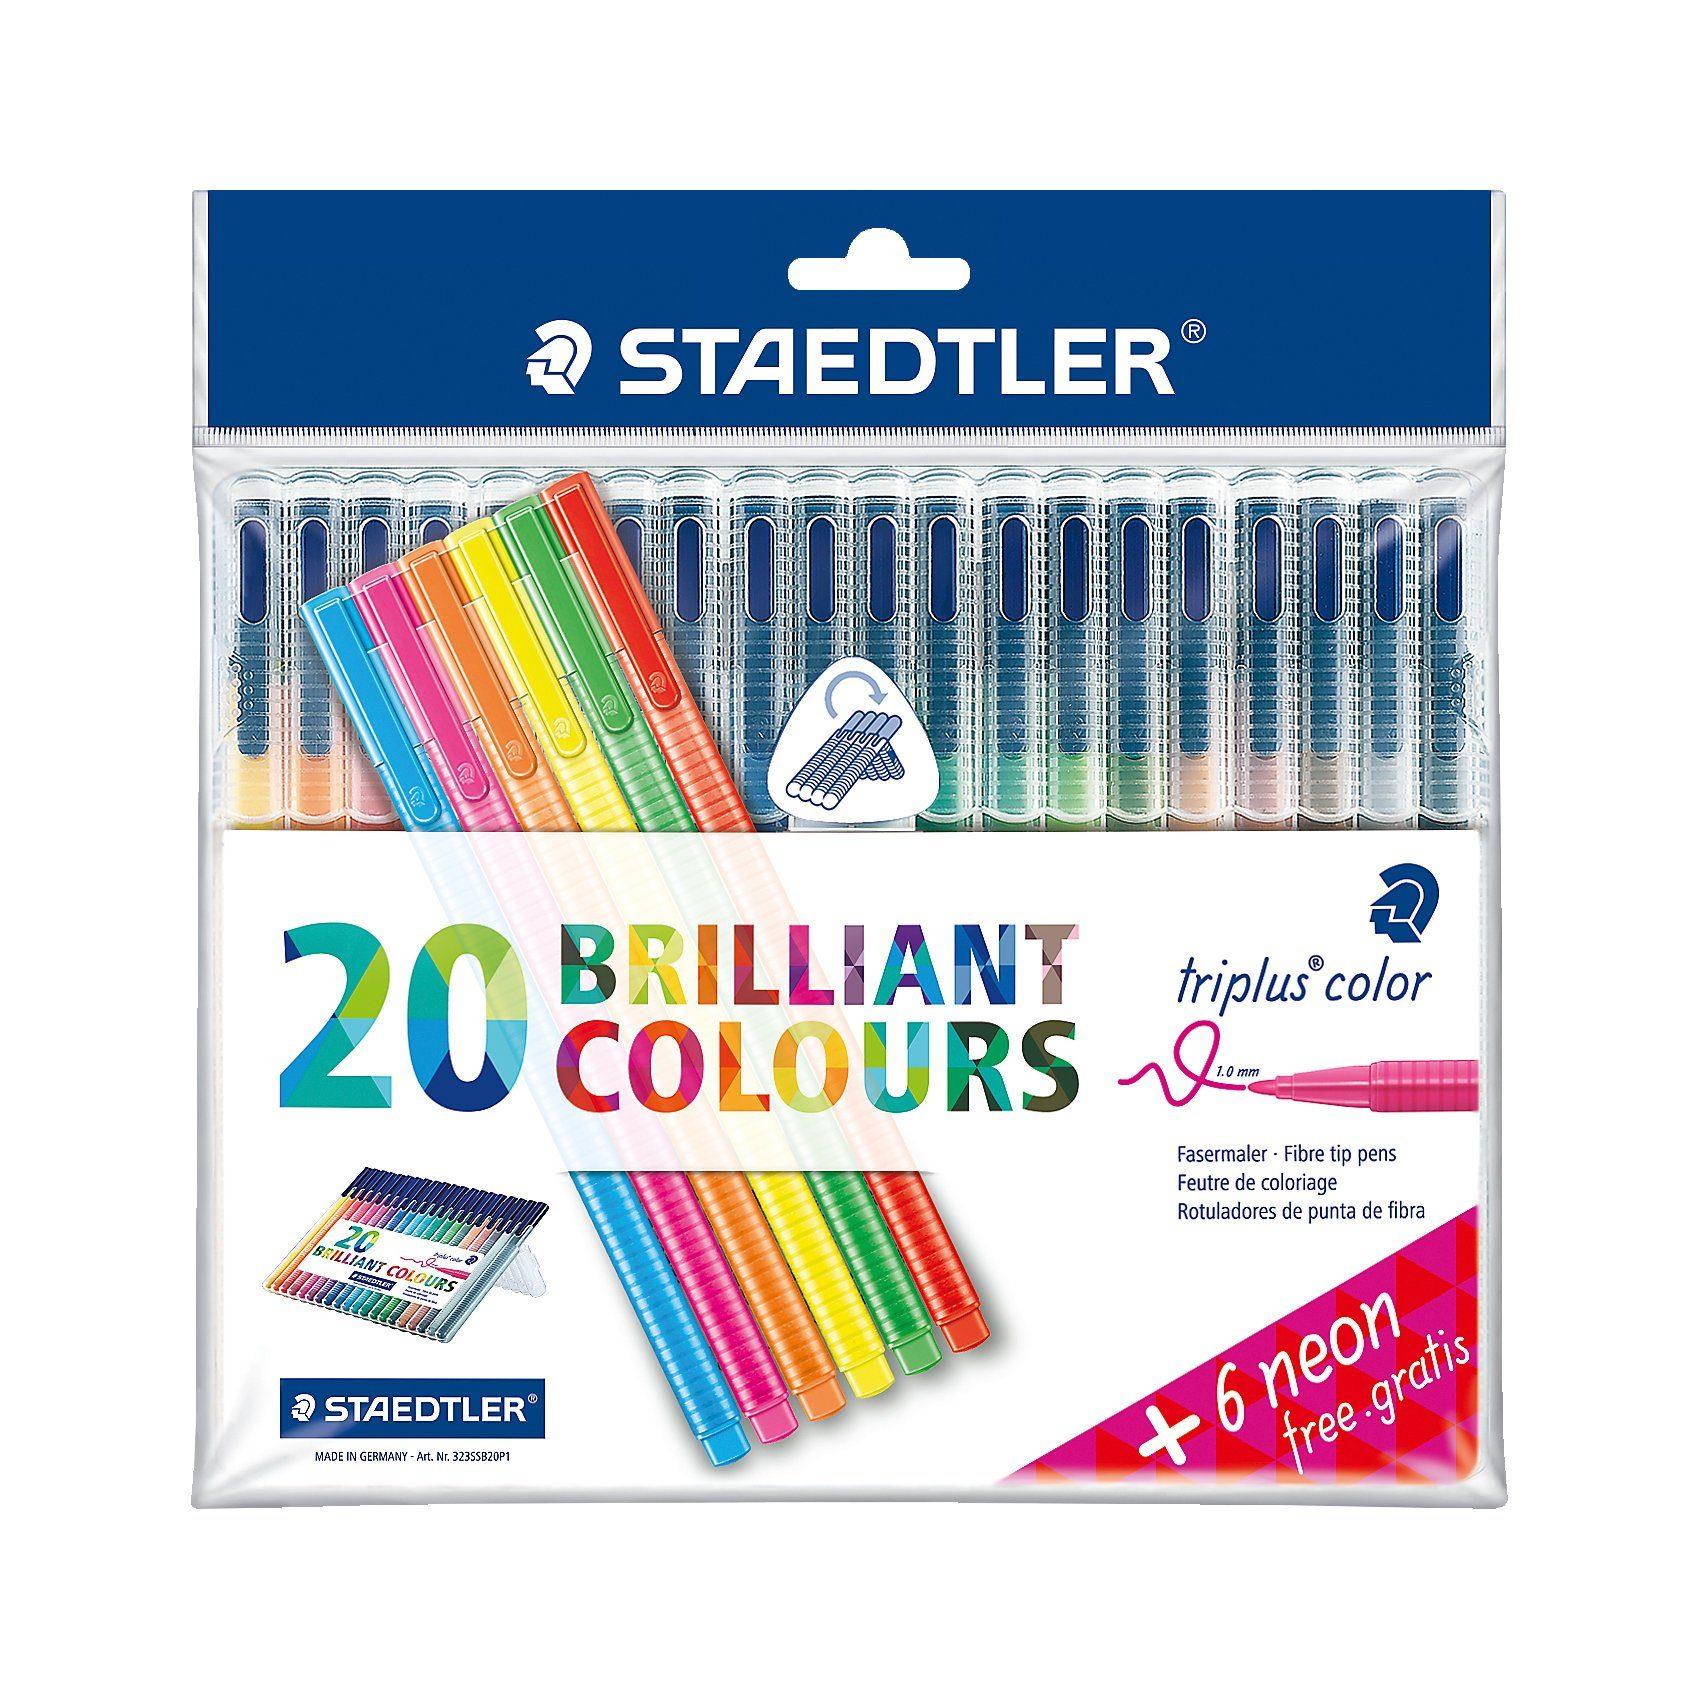 STAEDTLER Filzstifter triplus color DRY SAFE, 20 Farben & 6 Neon-Farbe